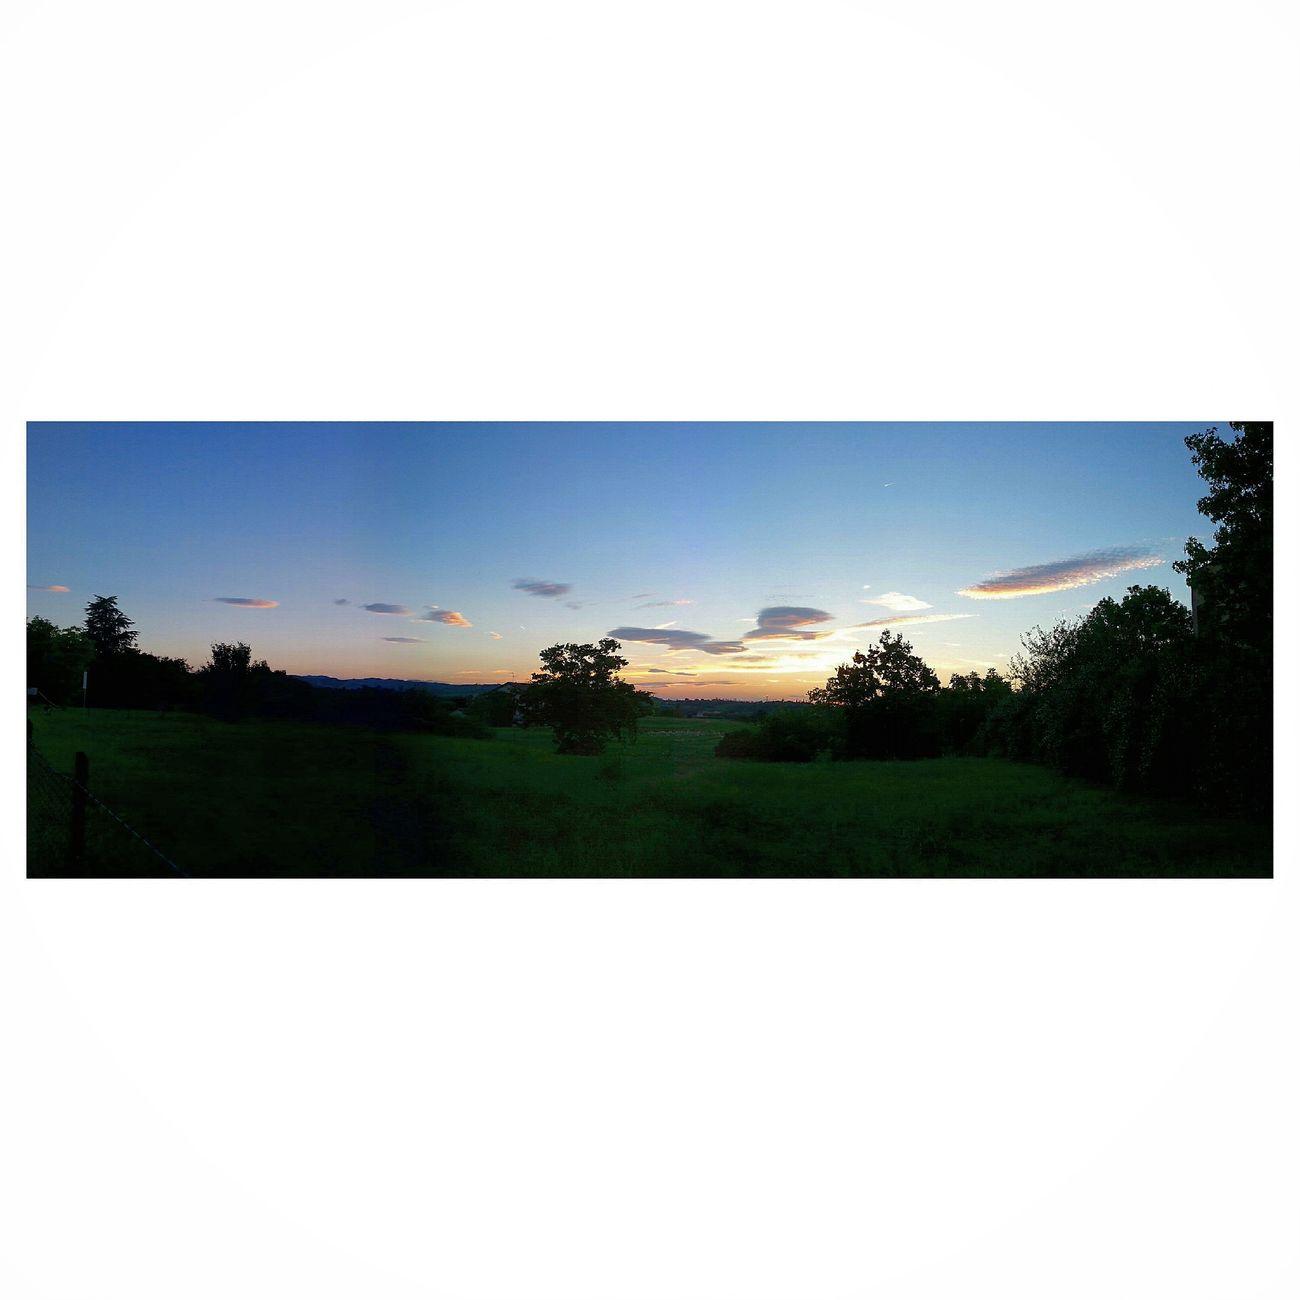 Sunrise Nature Makes Me Smile Hello World Landscape Darkness And Light